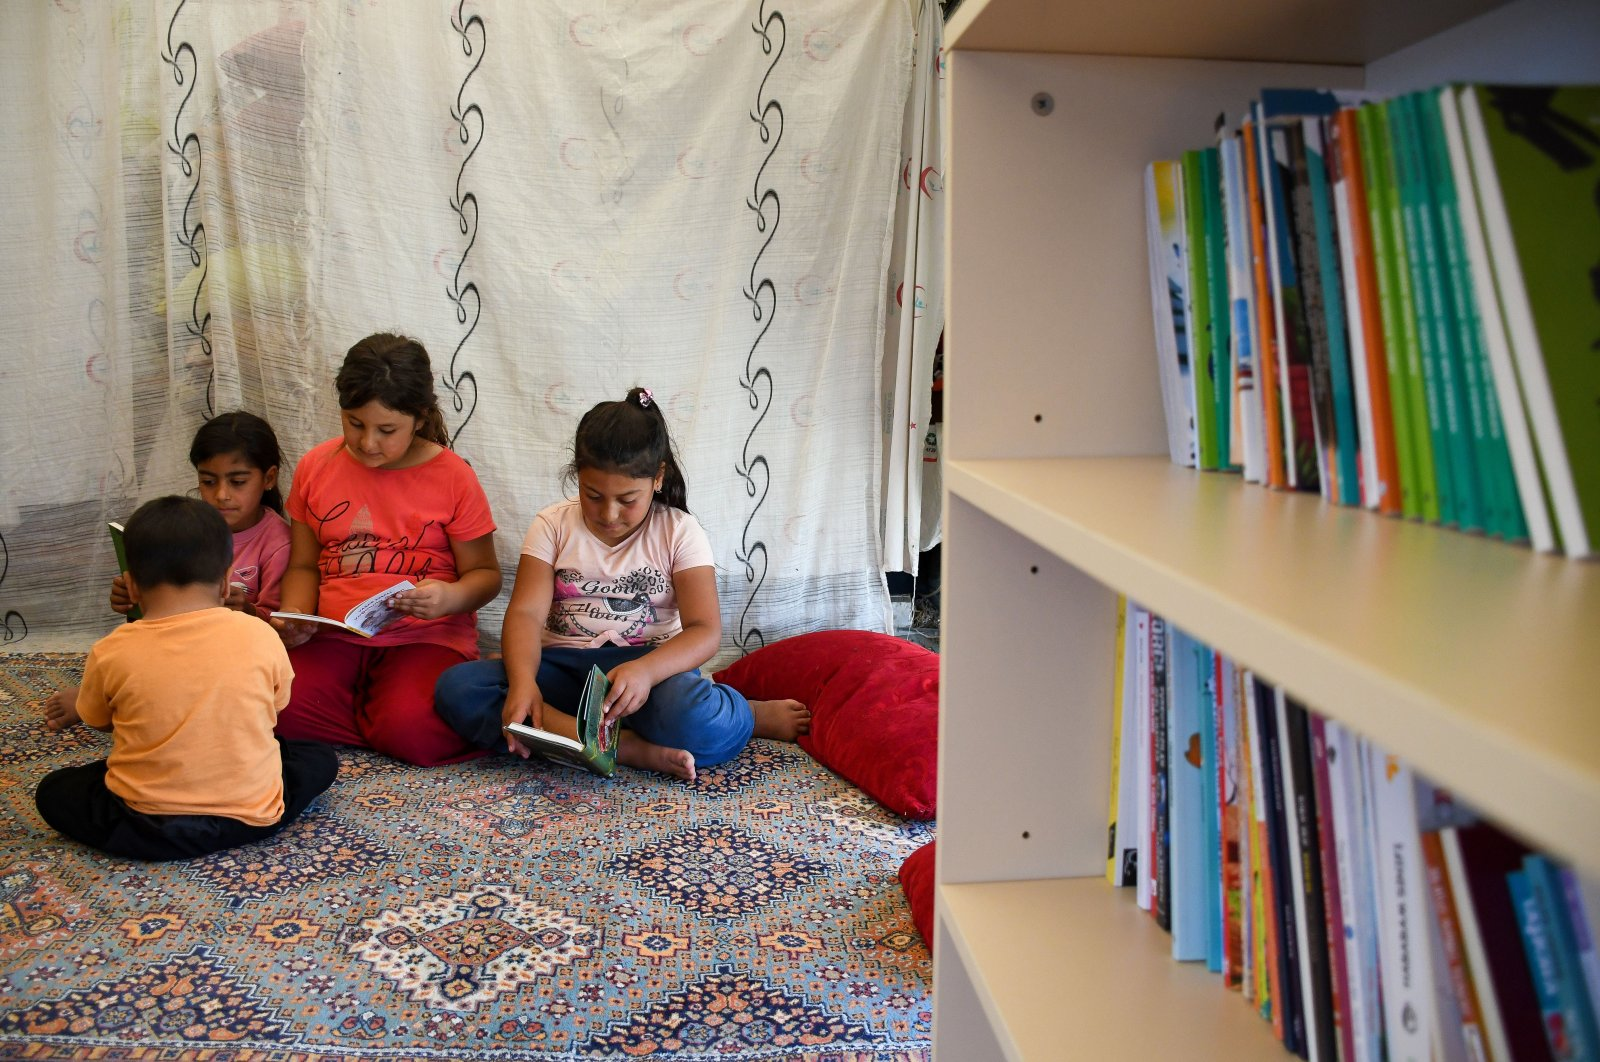 Children read books inside a tent, in Adana, southern Turkey, June 6, 2021. (AA PHOTO)